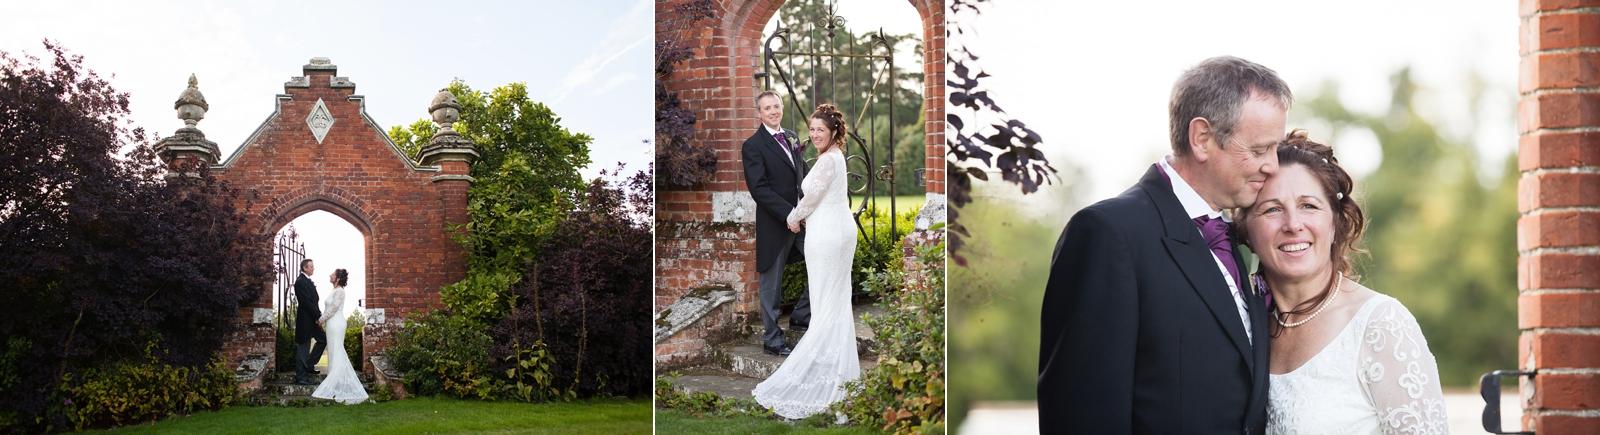 Hampshire Wedding Photography Elvetham Hotel Lilybean Photography 027